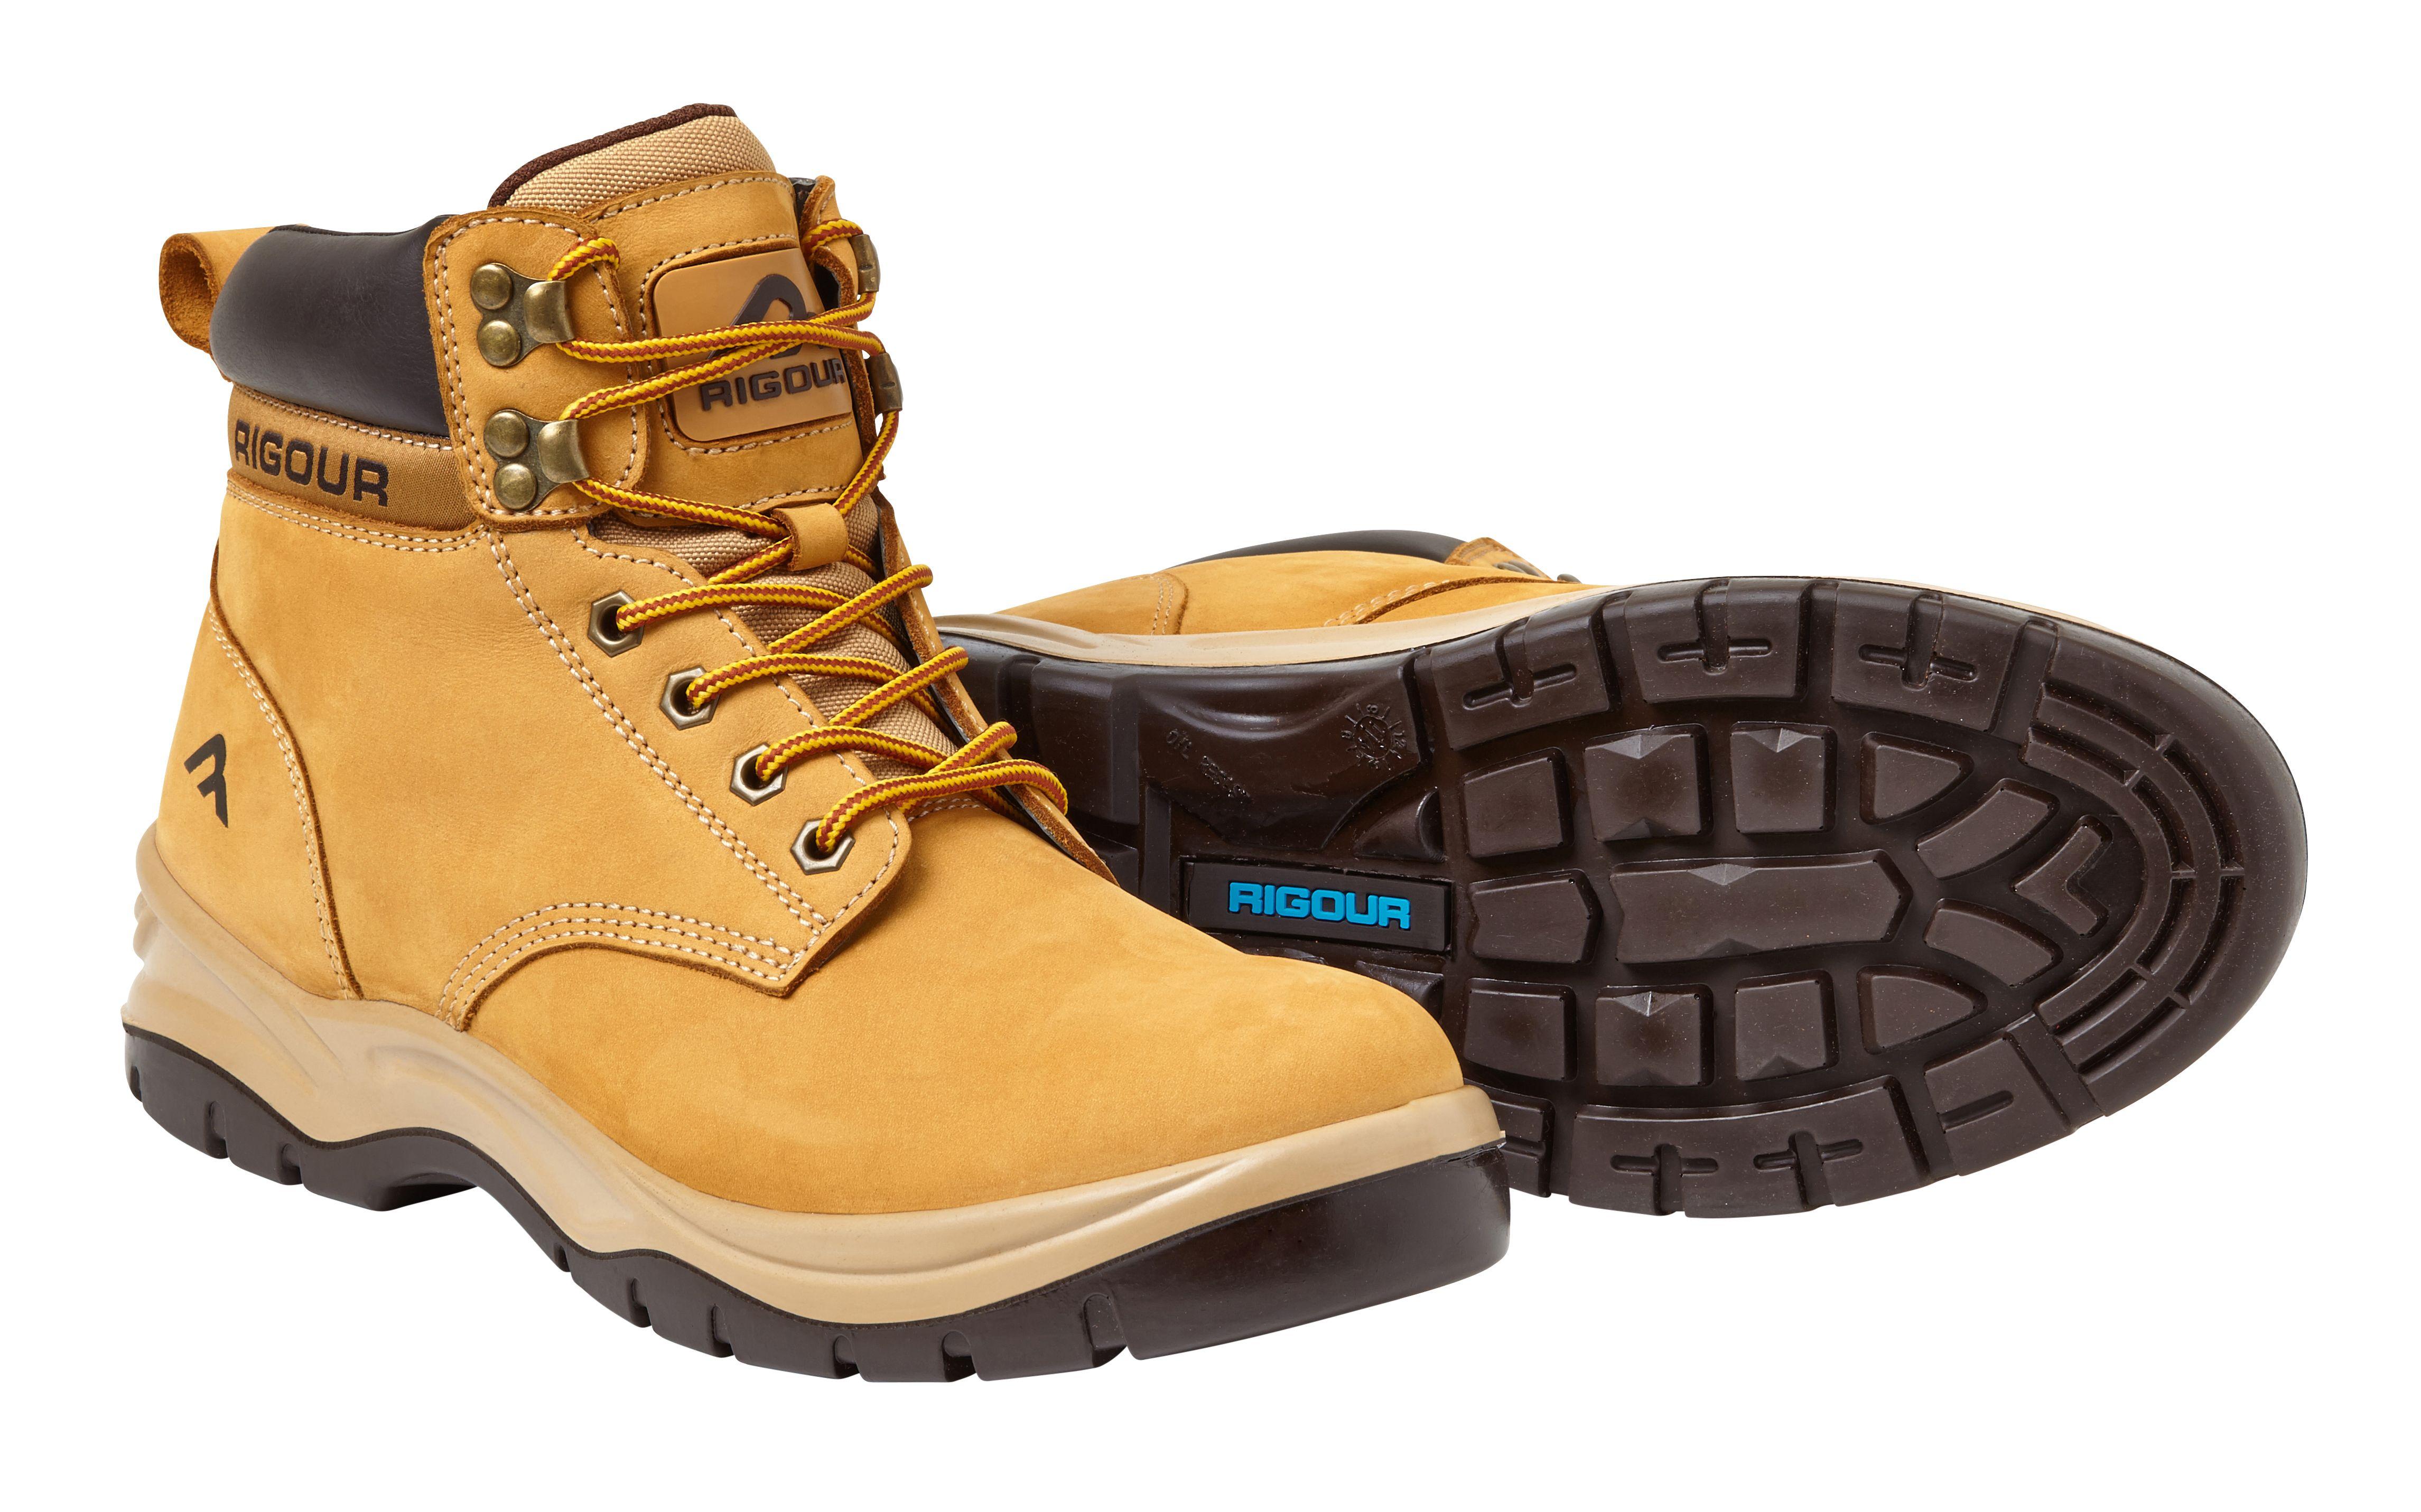 Rigour Wheat Safety Work Boots, Size 8